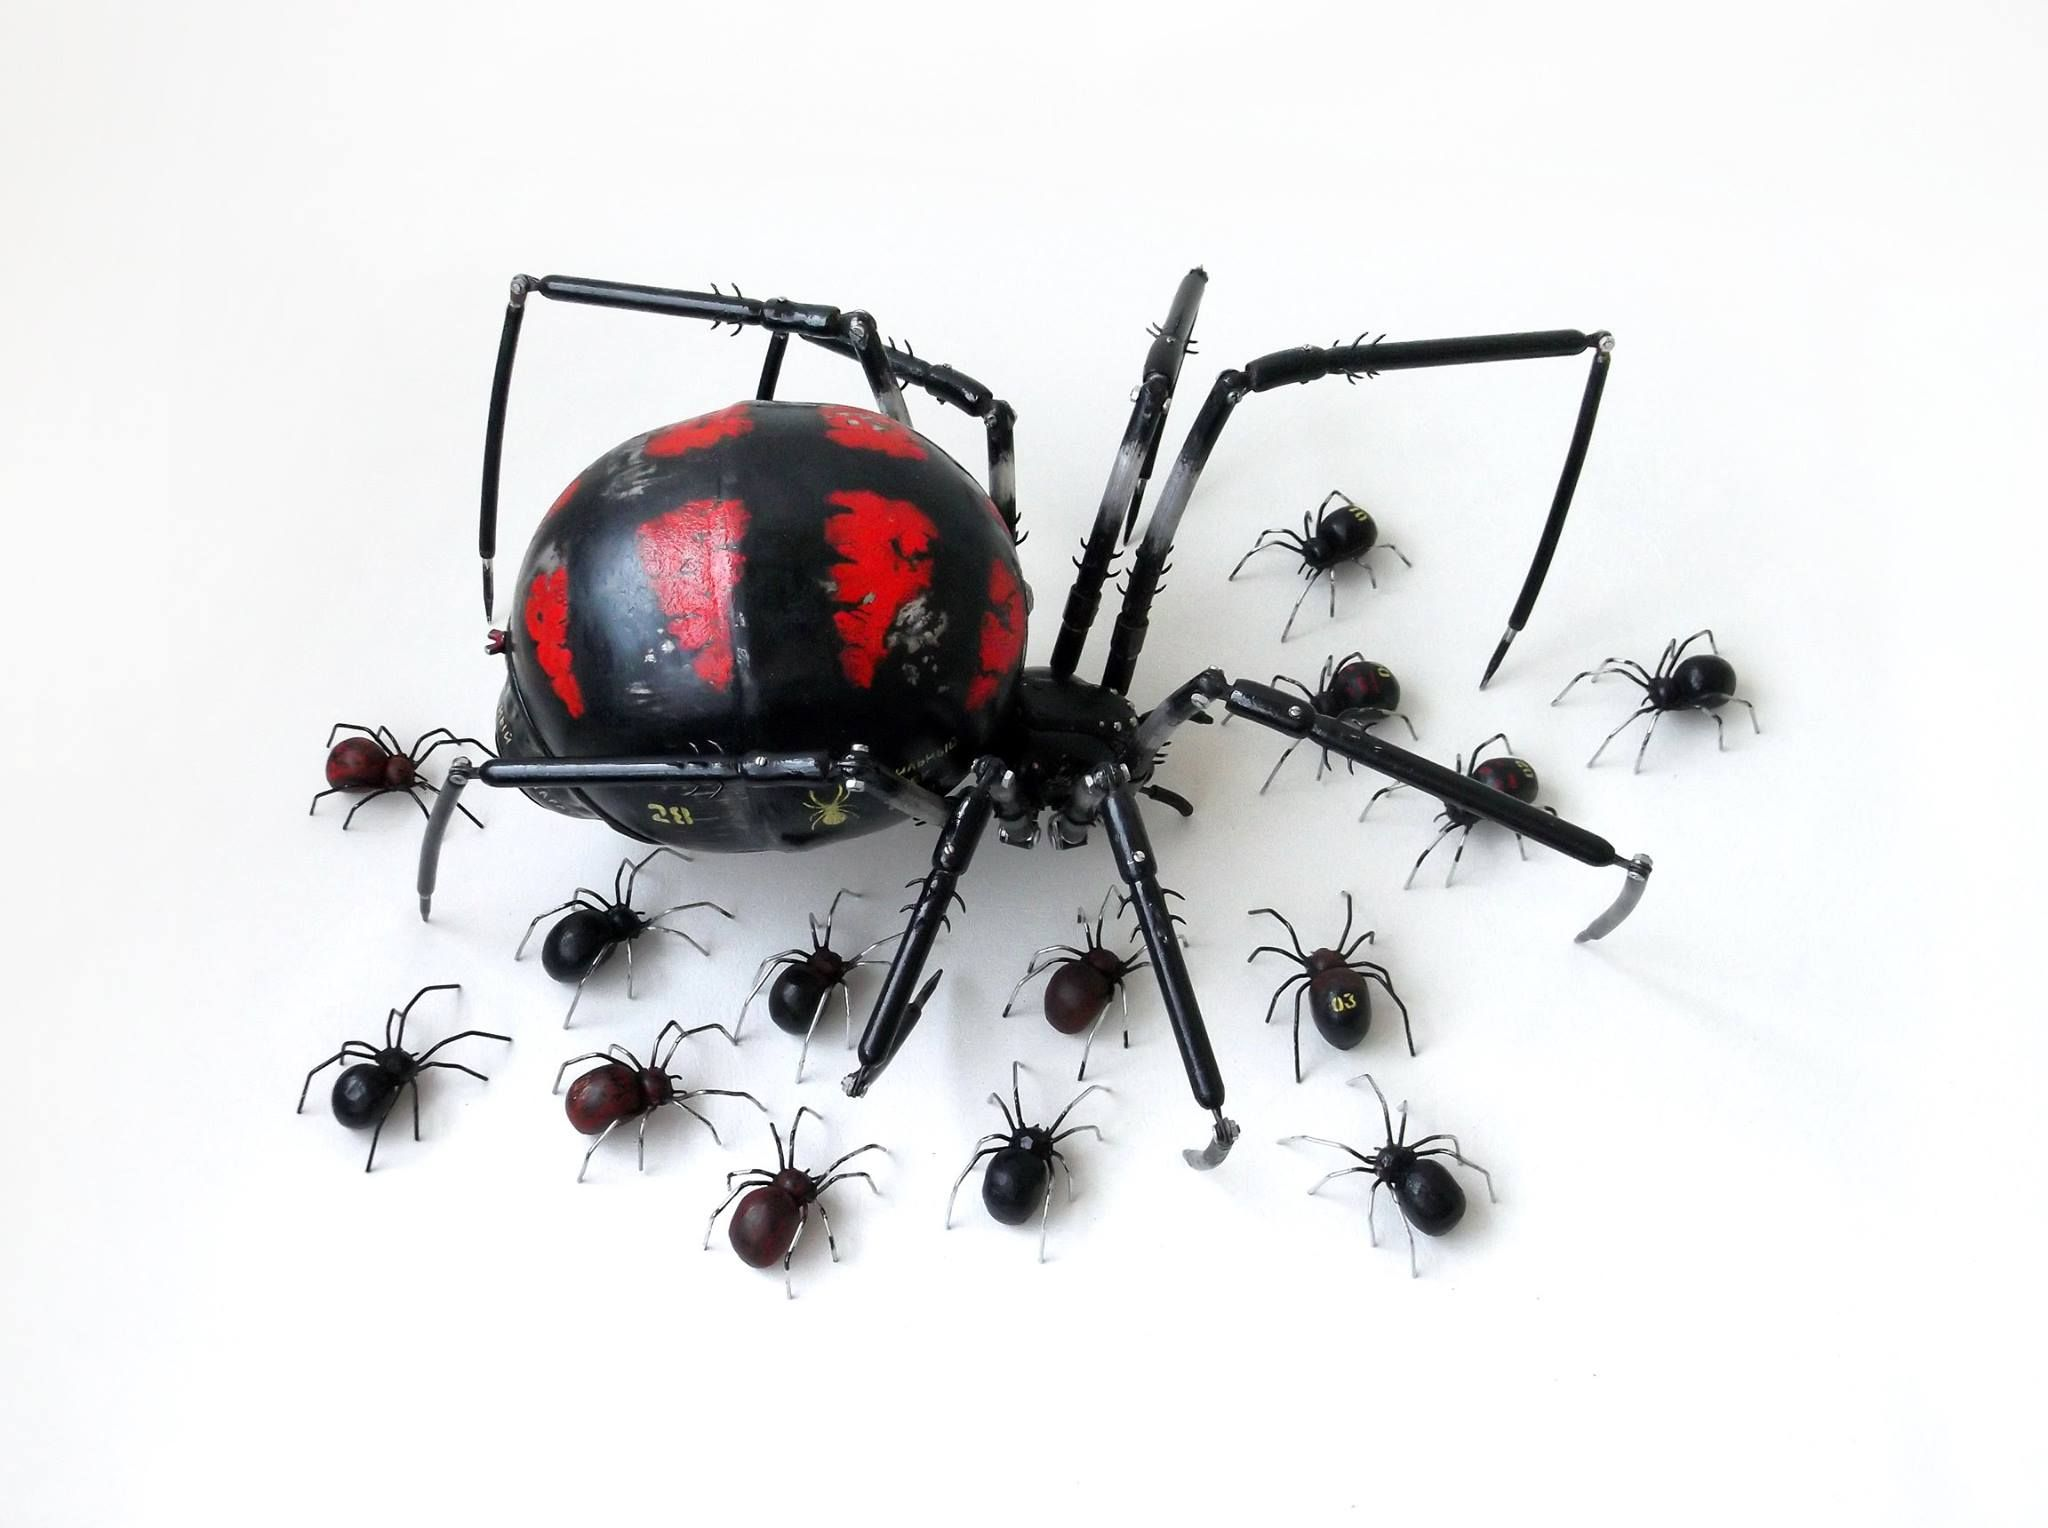 metal sculptures by igor verniy metal art. Black Bedroom Furniture Sets. Home Design Ideas